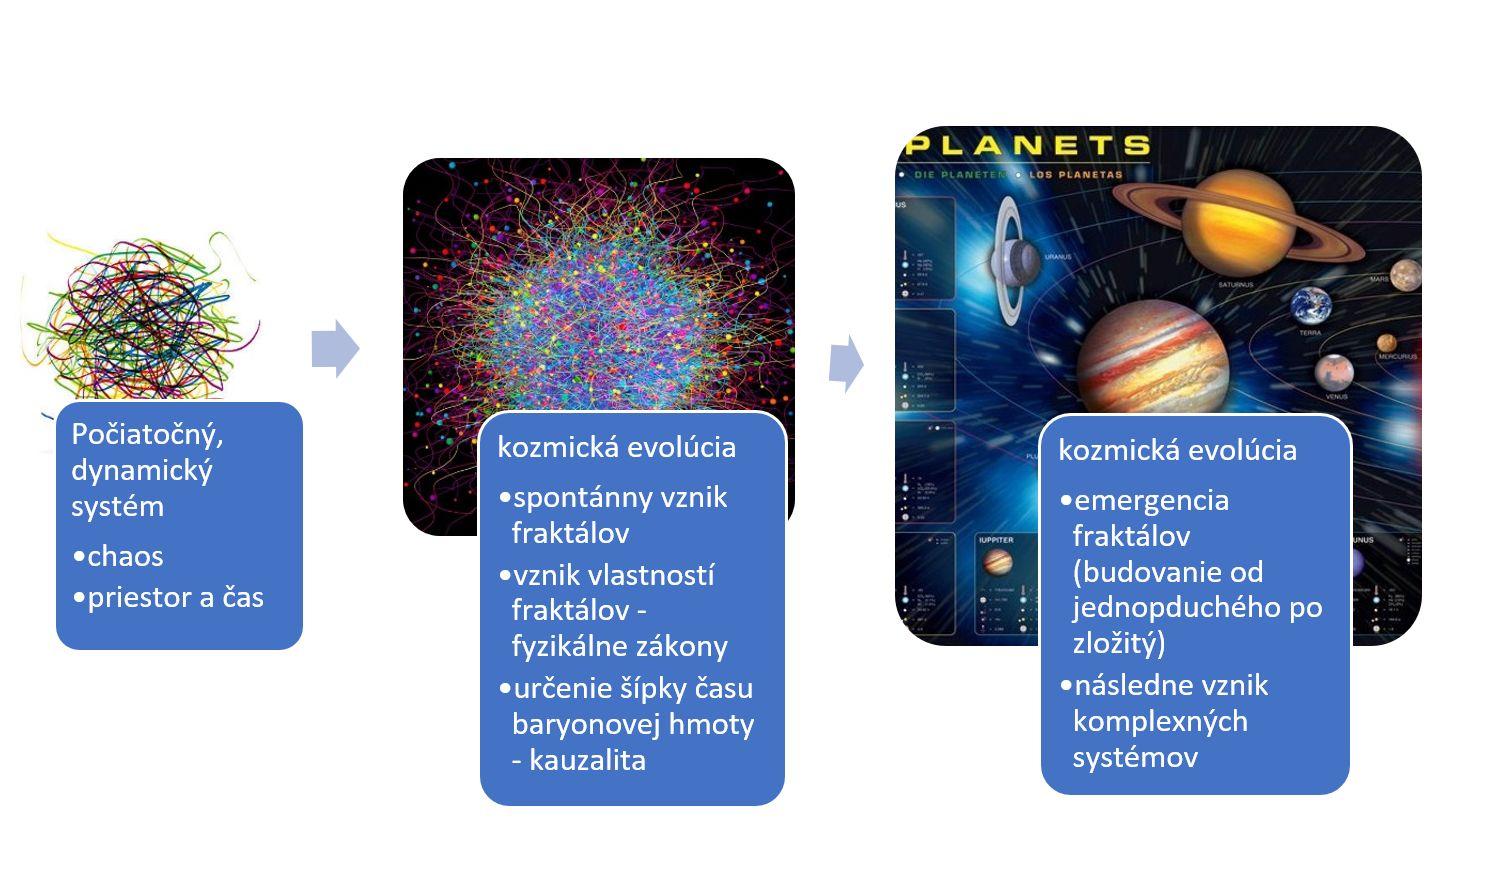 kozmicka eveoluciajpg